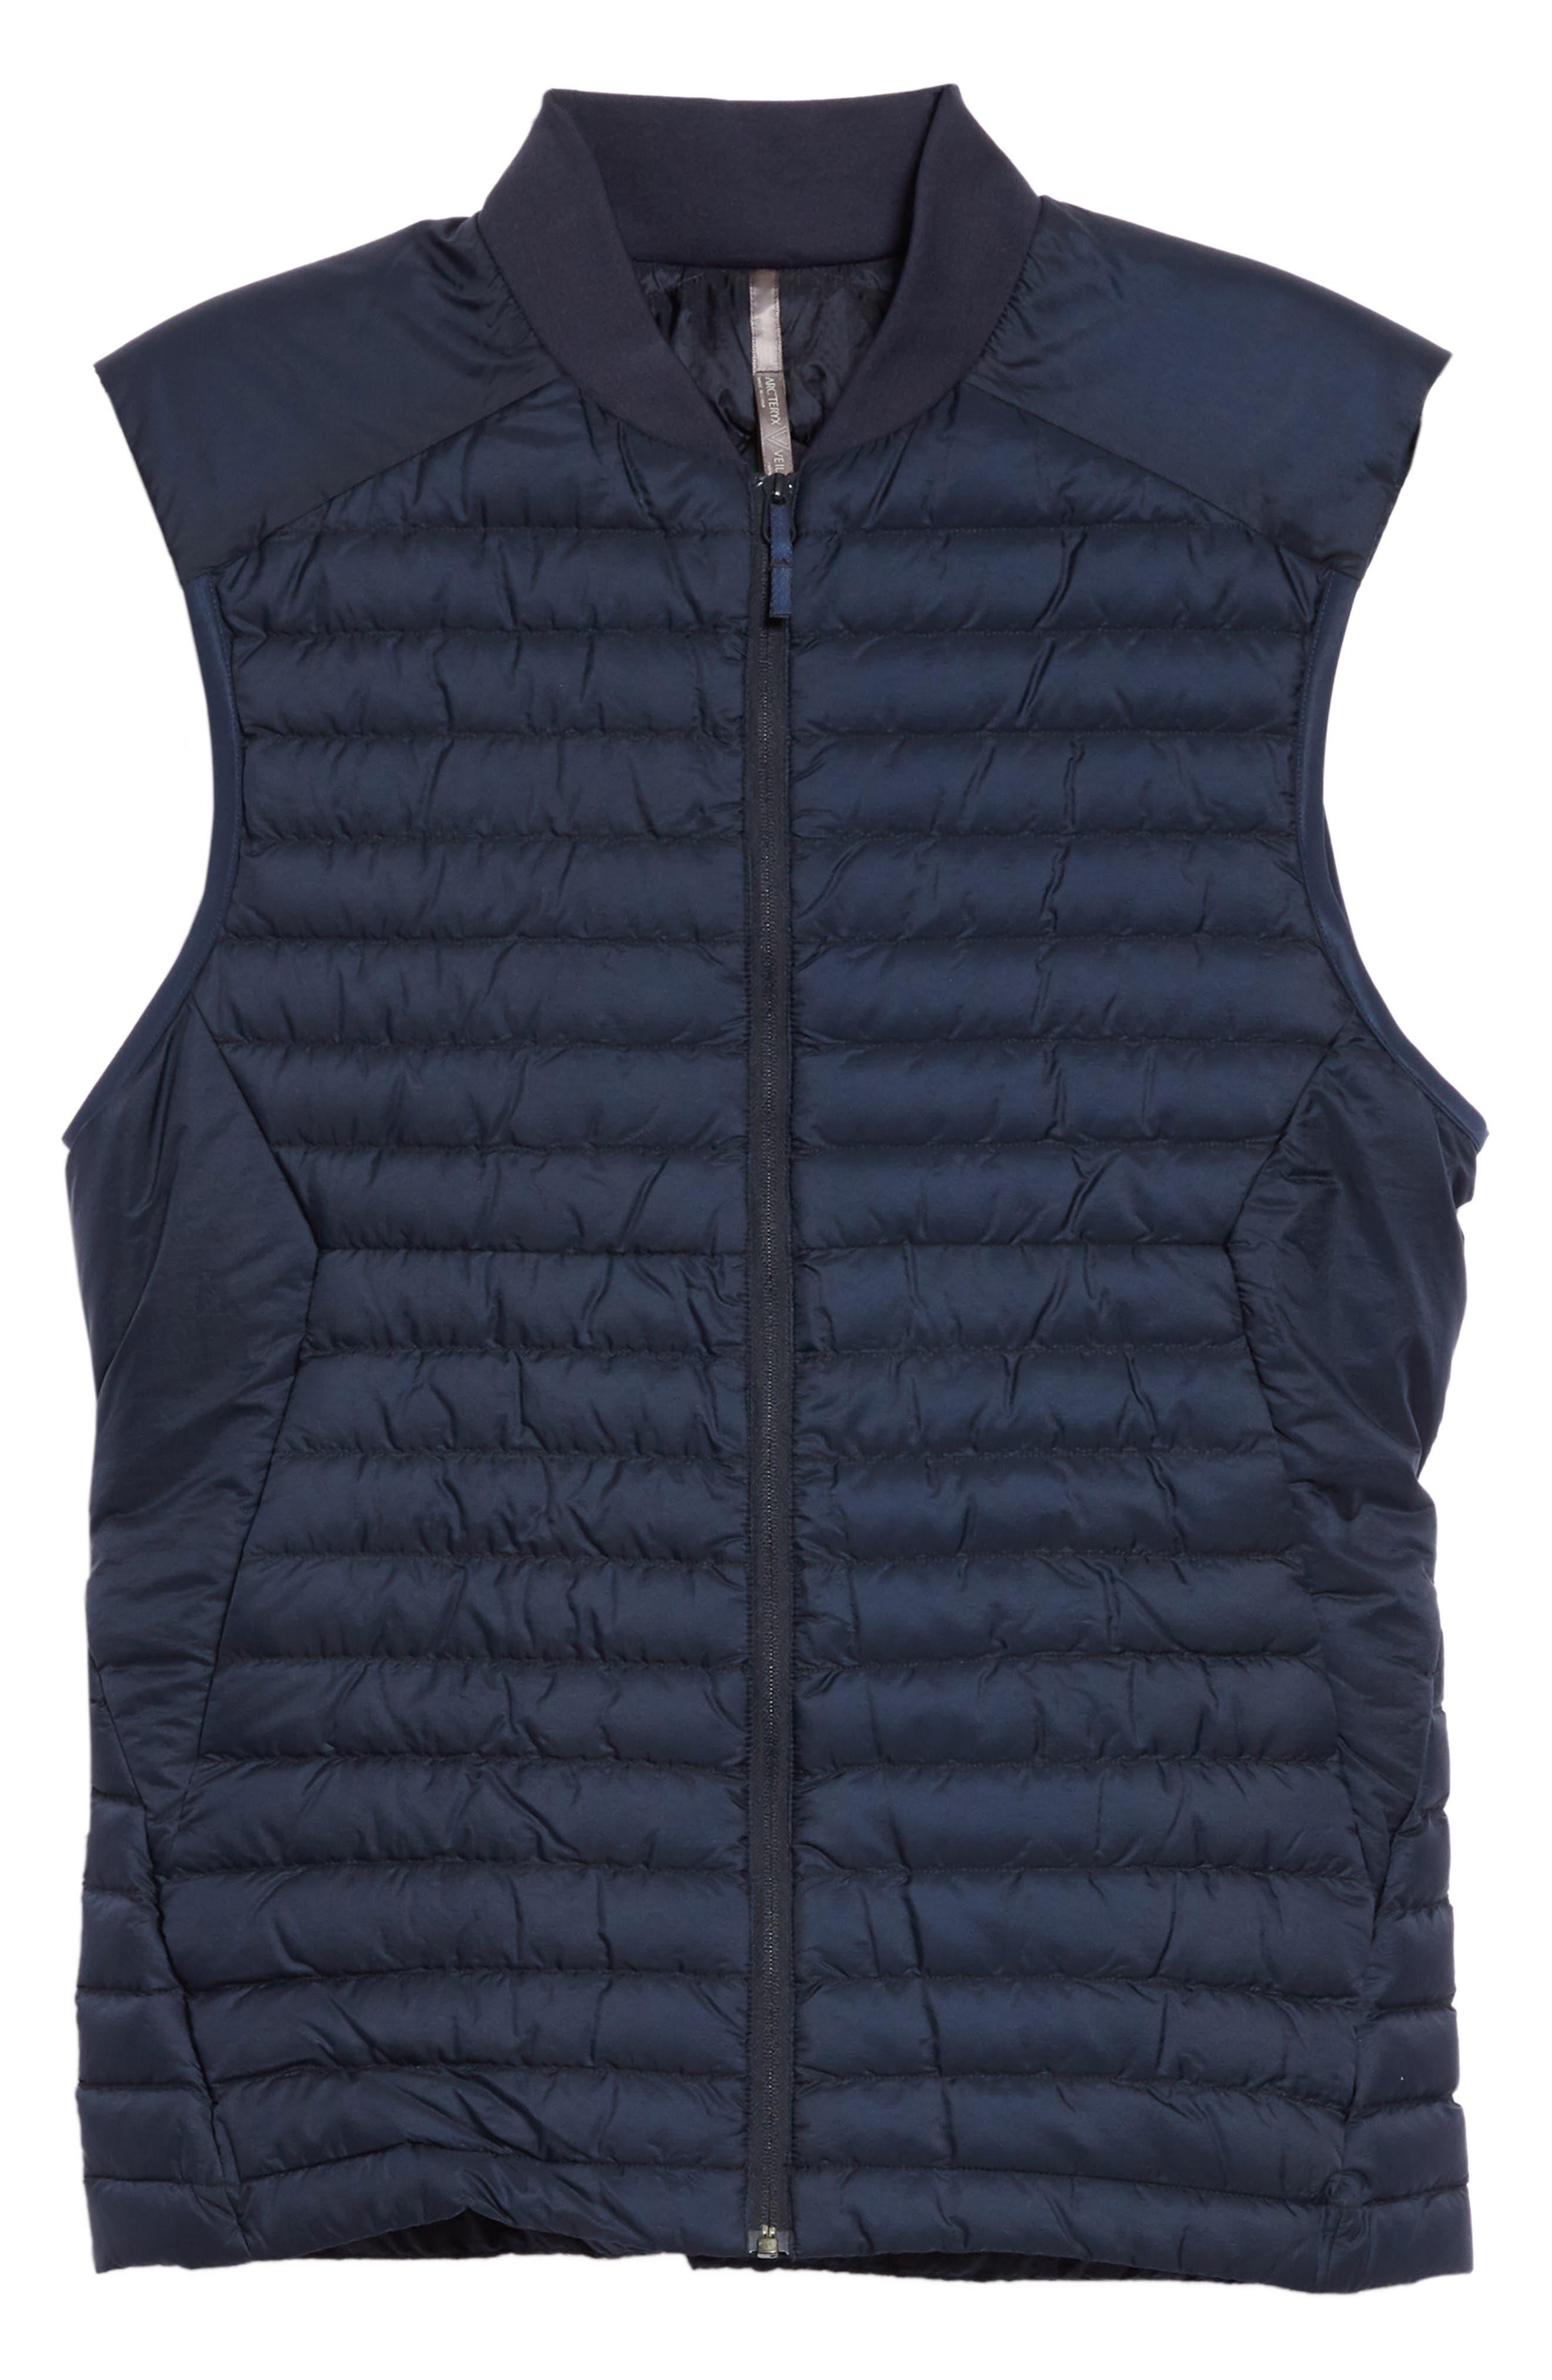 ARC'TERYX VEILANCE Conduit Lightweight Down Vest, Main, color, 410